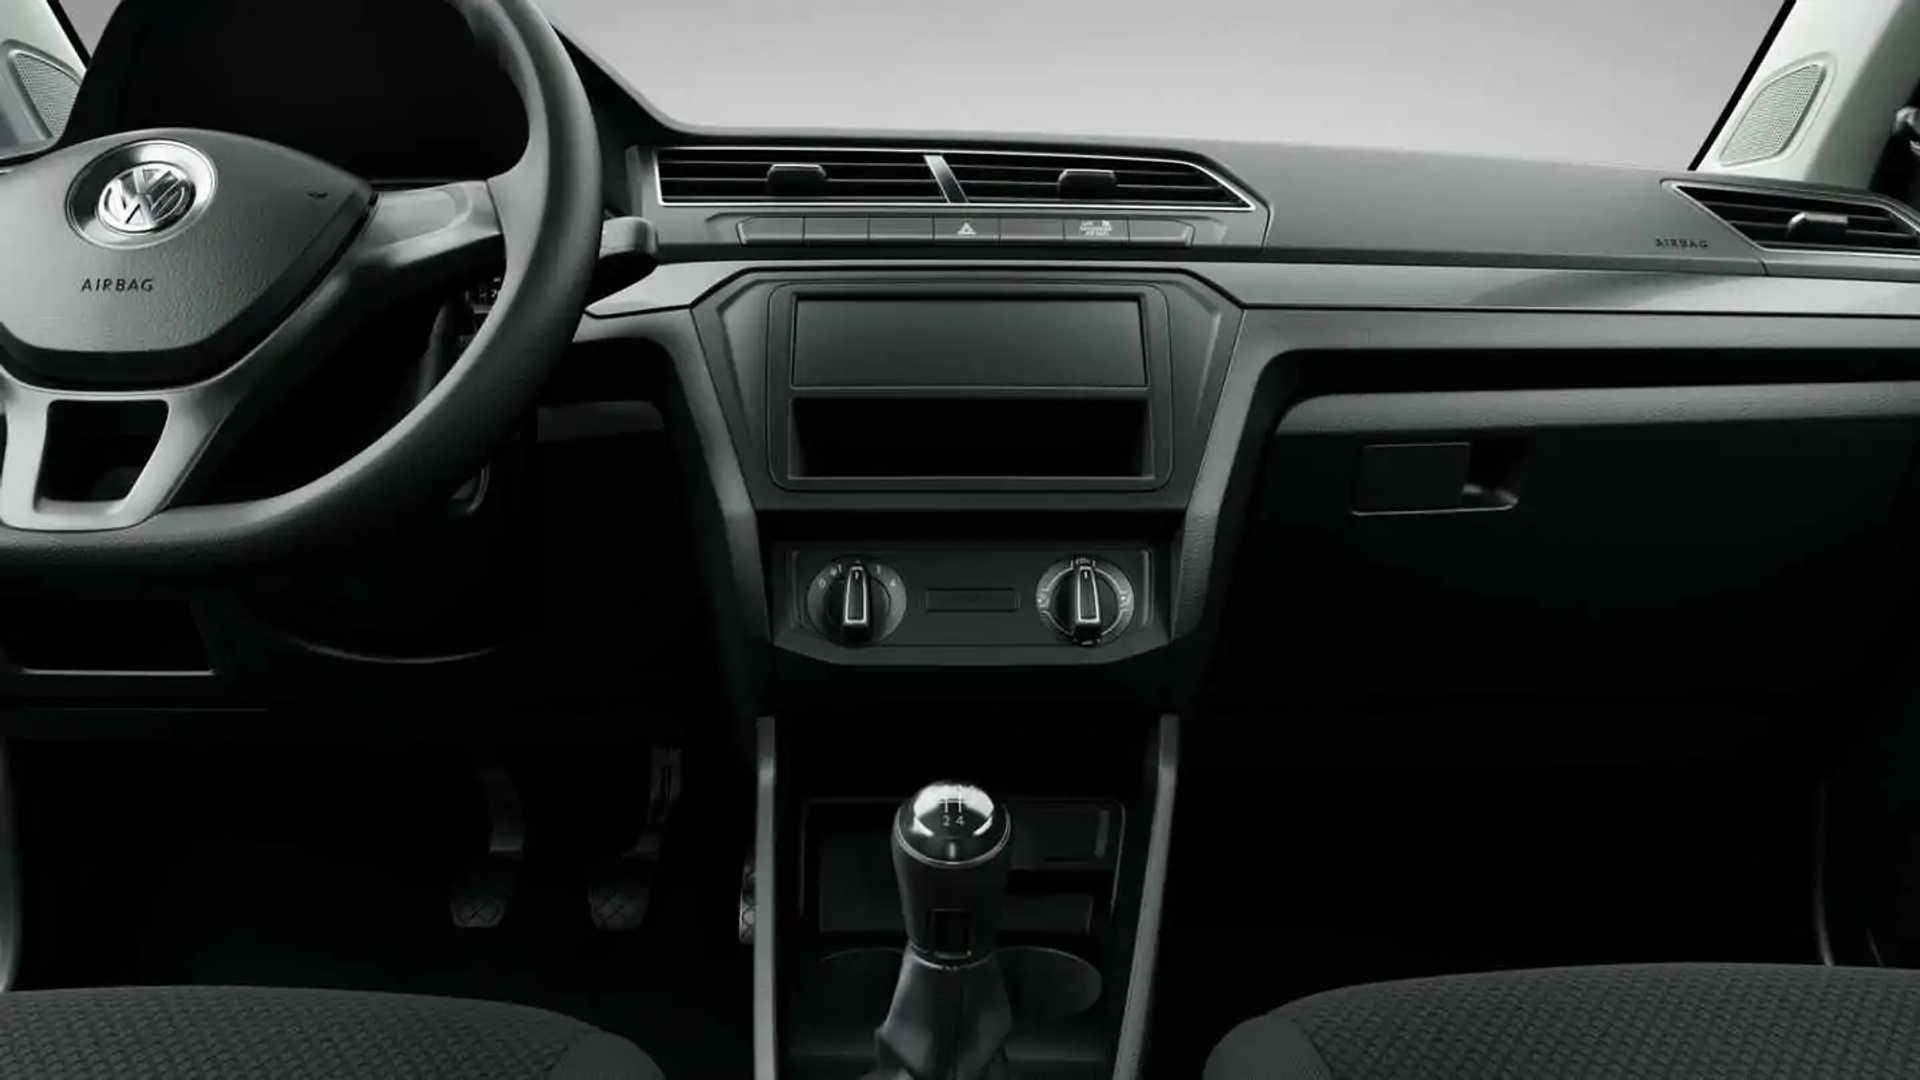 Volkswagen Gol, Saveiro e Voyage 2020 chegam com poucas mudanças Volkswagen-gol-saveiro-e-voyage-2020